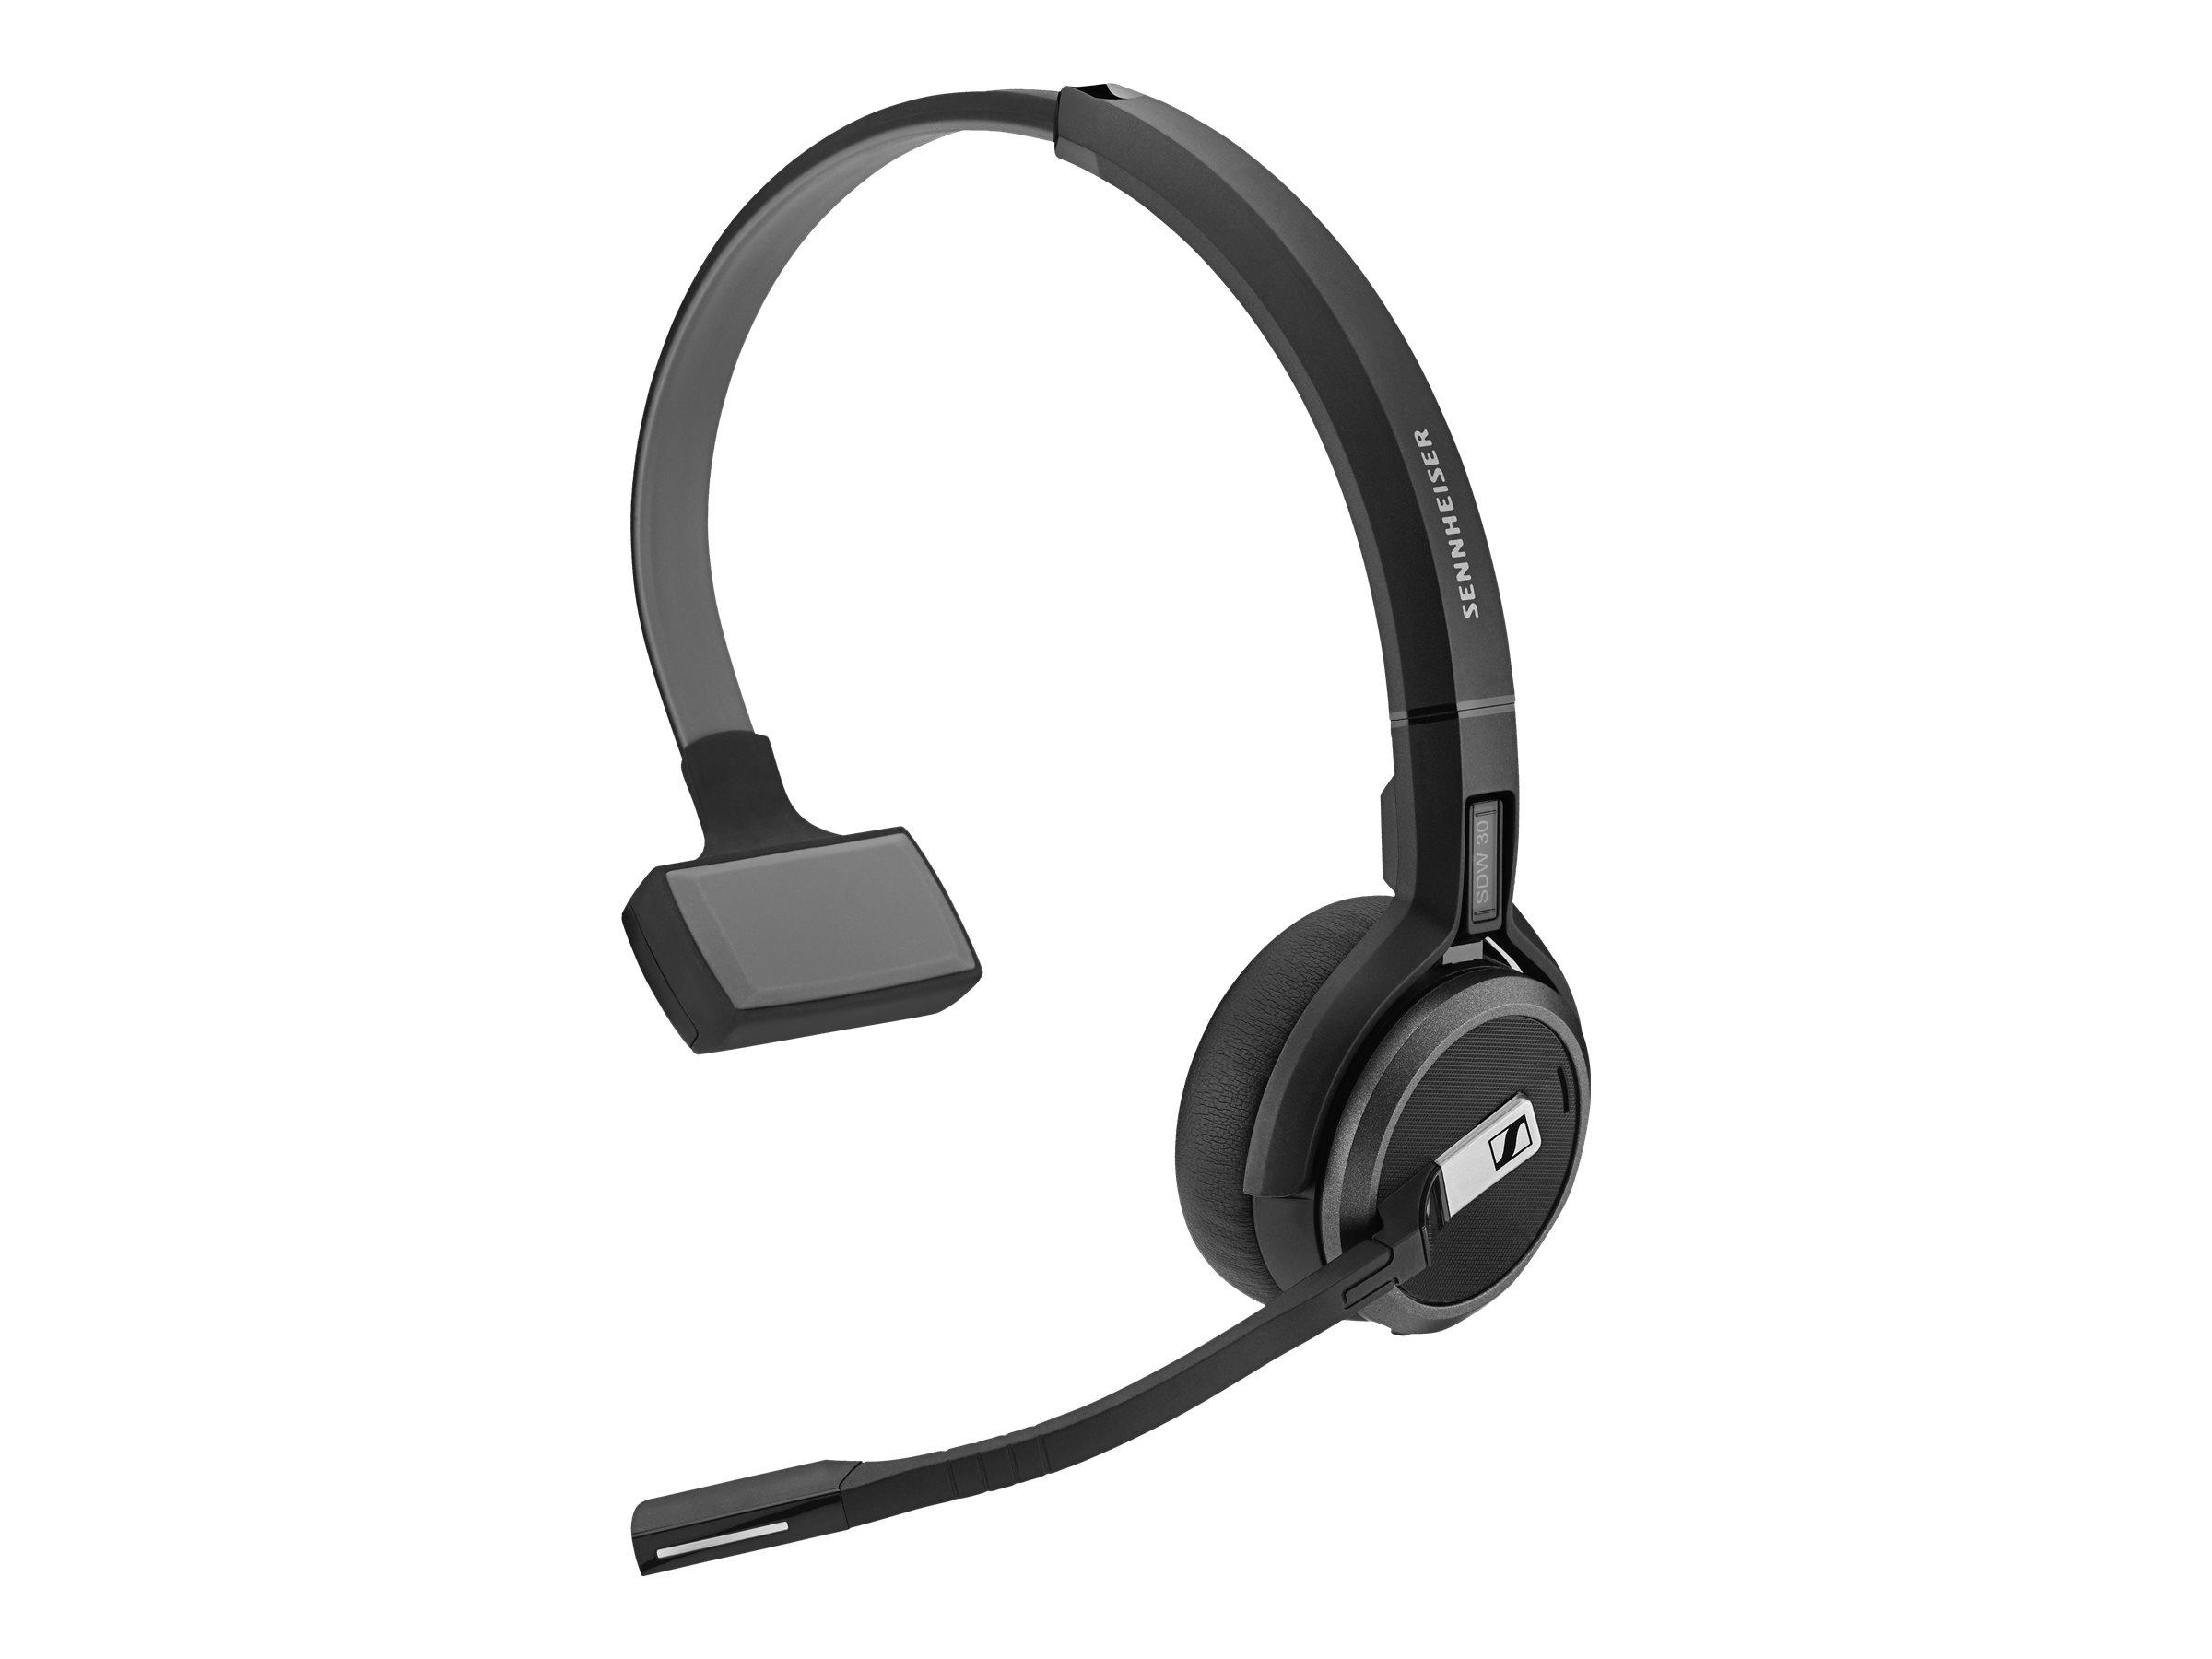 Sennheiser SDW 30 HS - Headset - On-Ear - DECT - kabellos - aktive Rauschunterdrückung